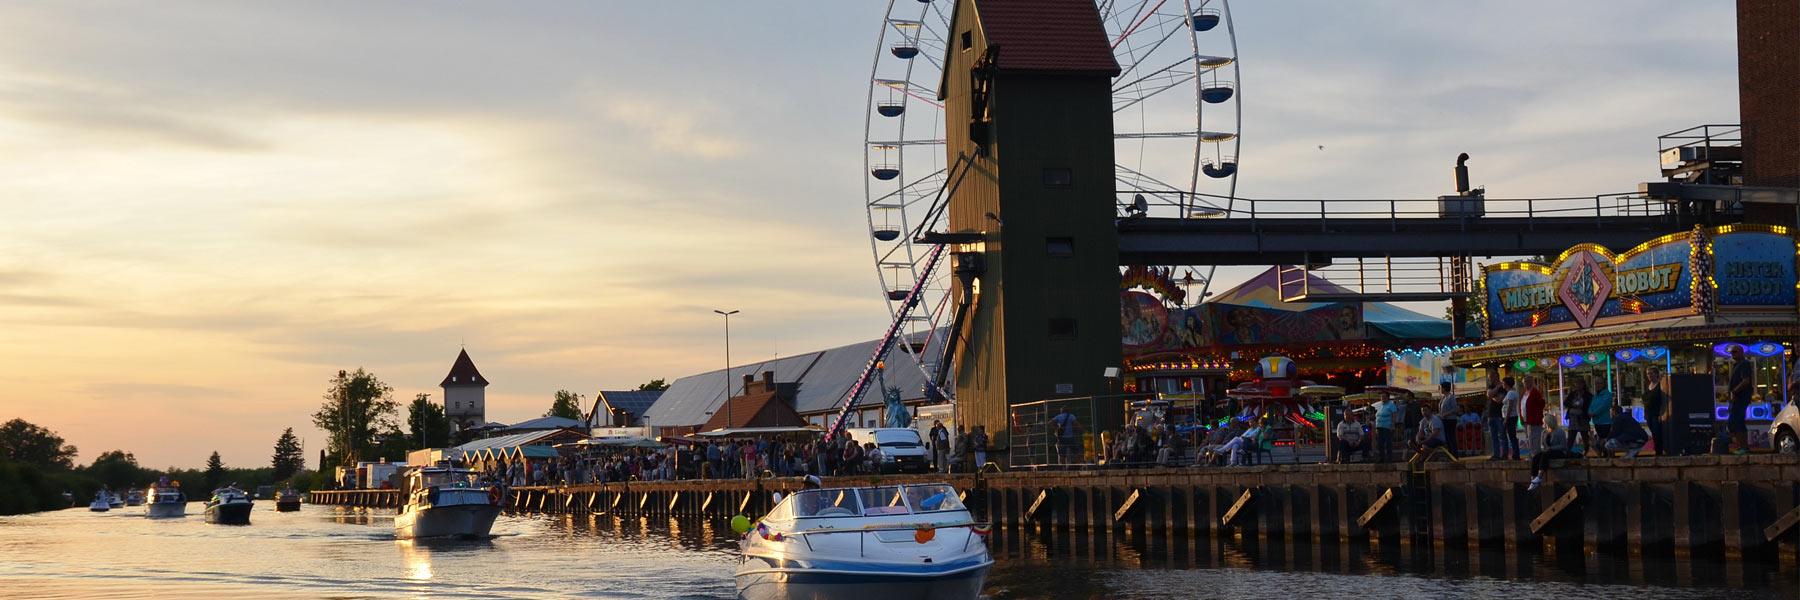 Peenefest - Stadtinformation Hansestadt Demmin